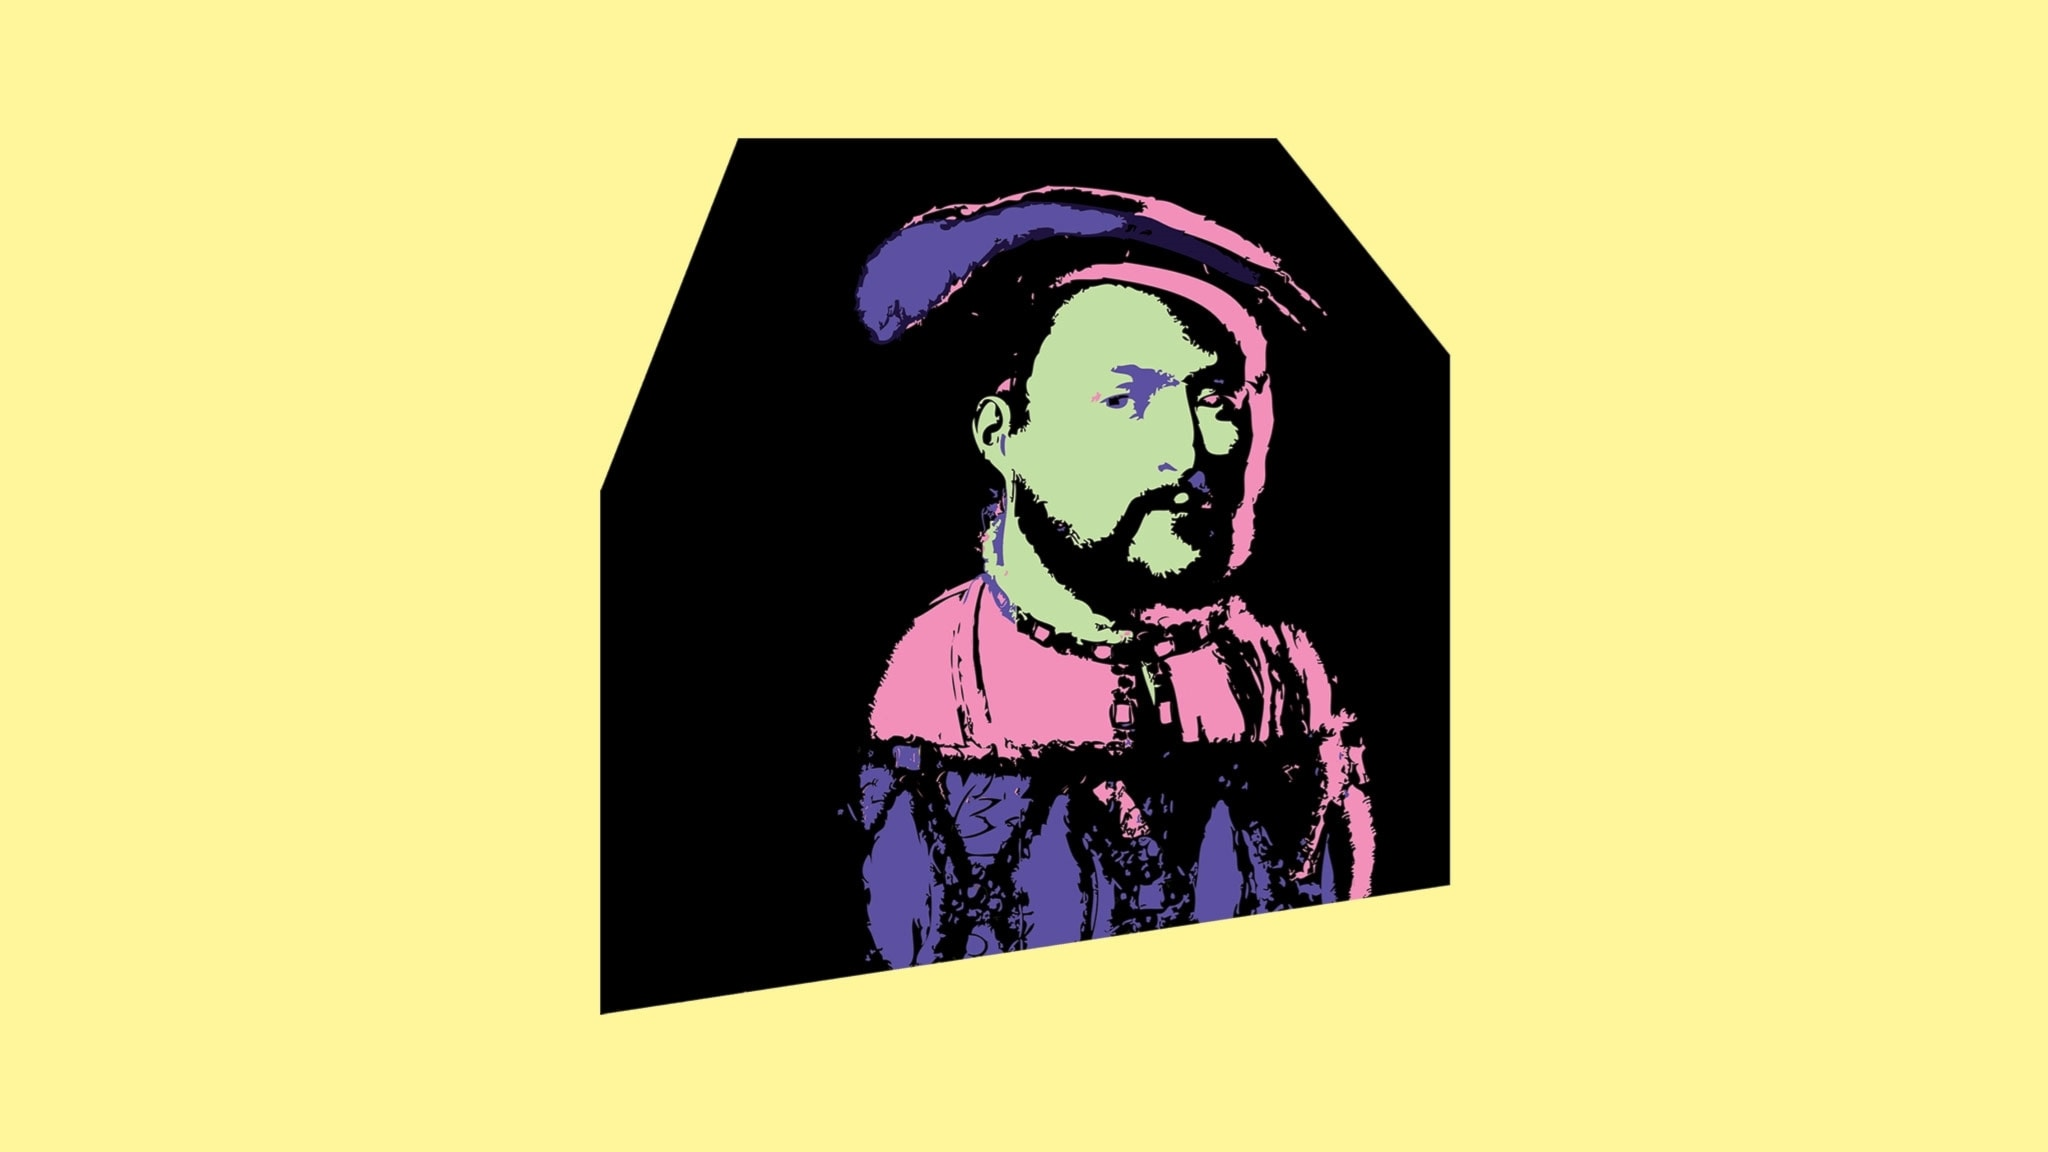 Henrik VIII - hustrumord och storhetsvansinne